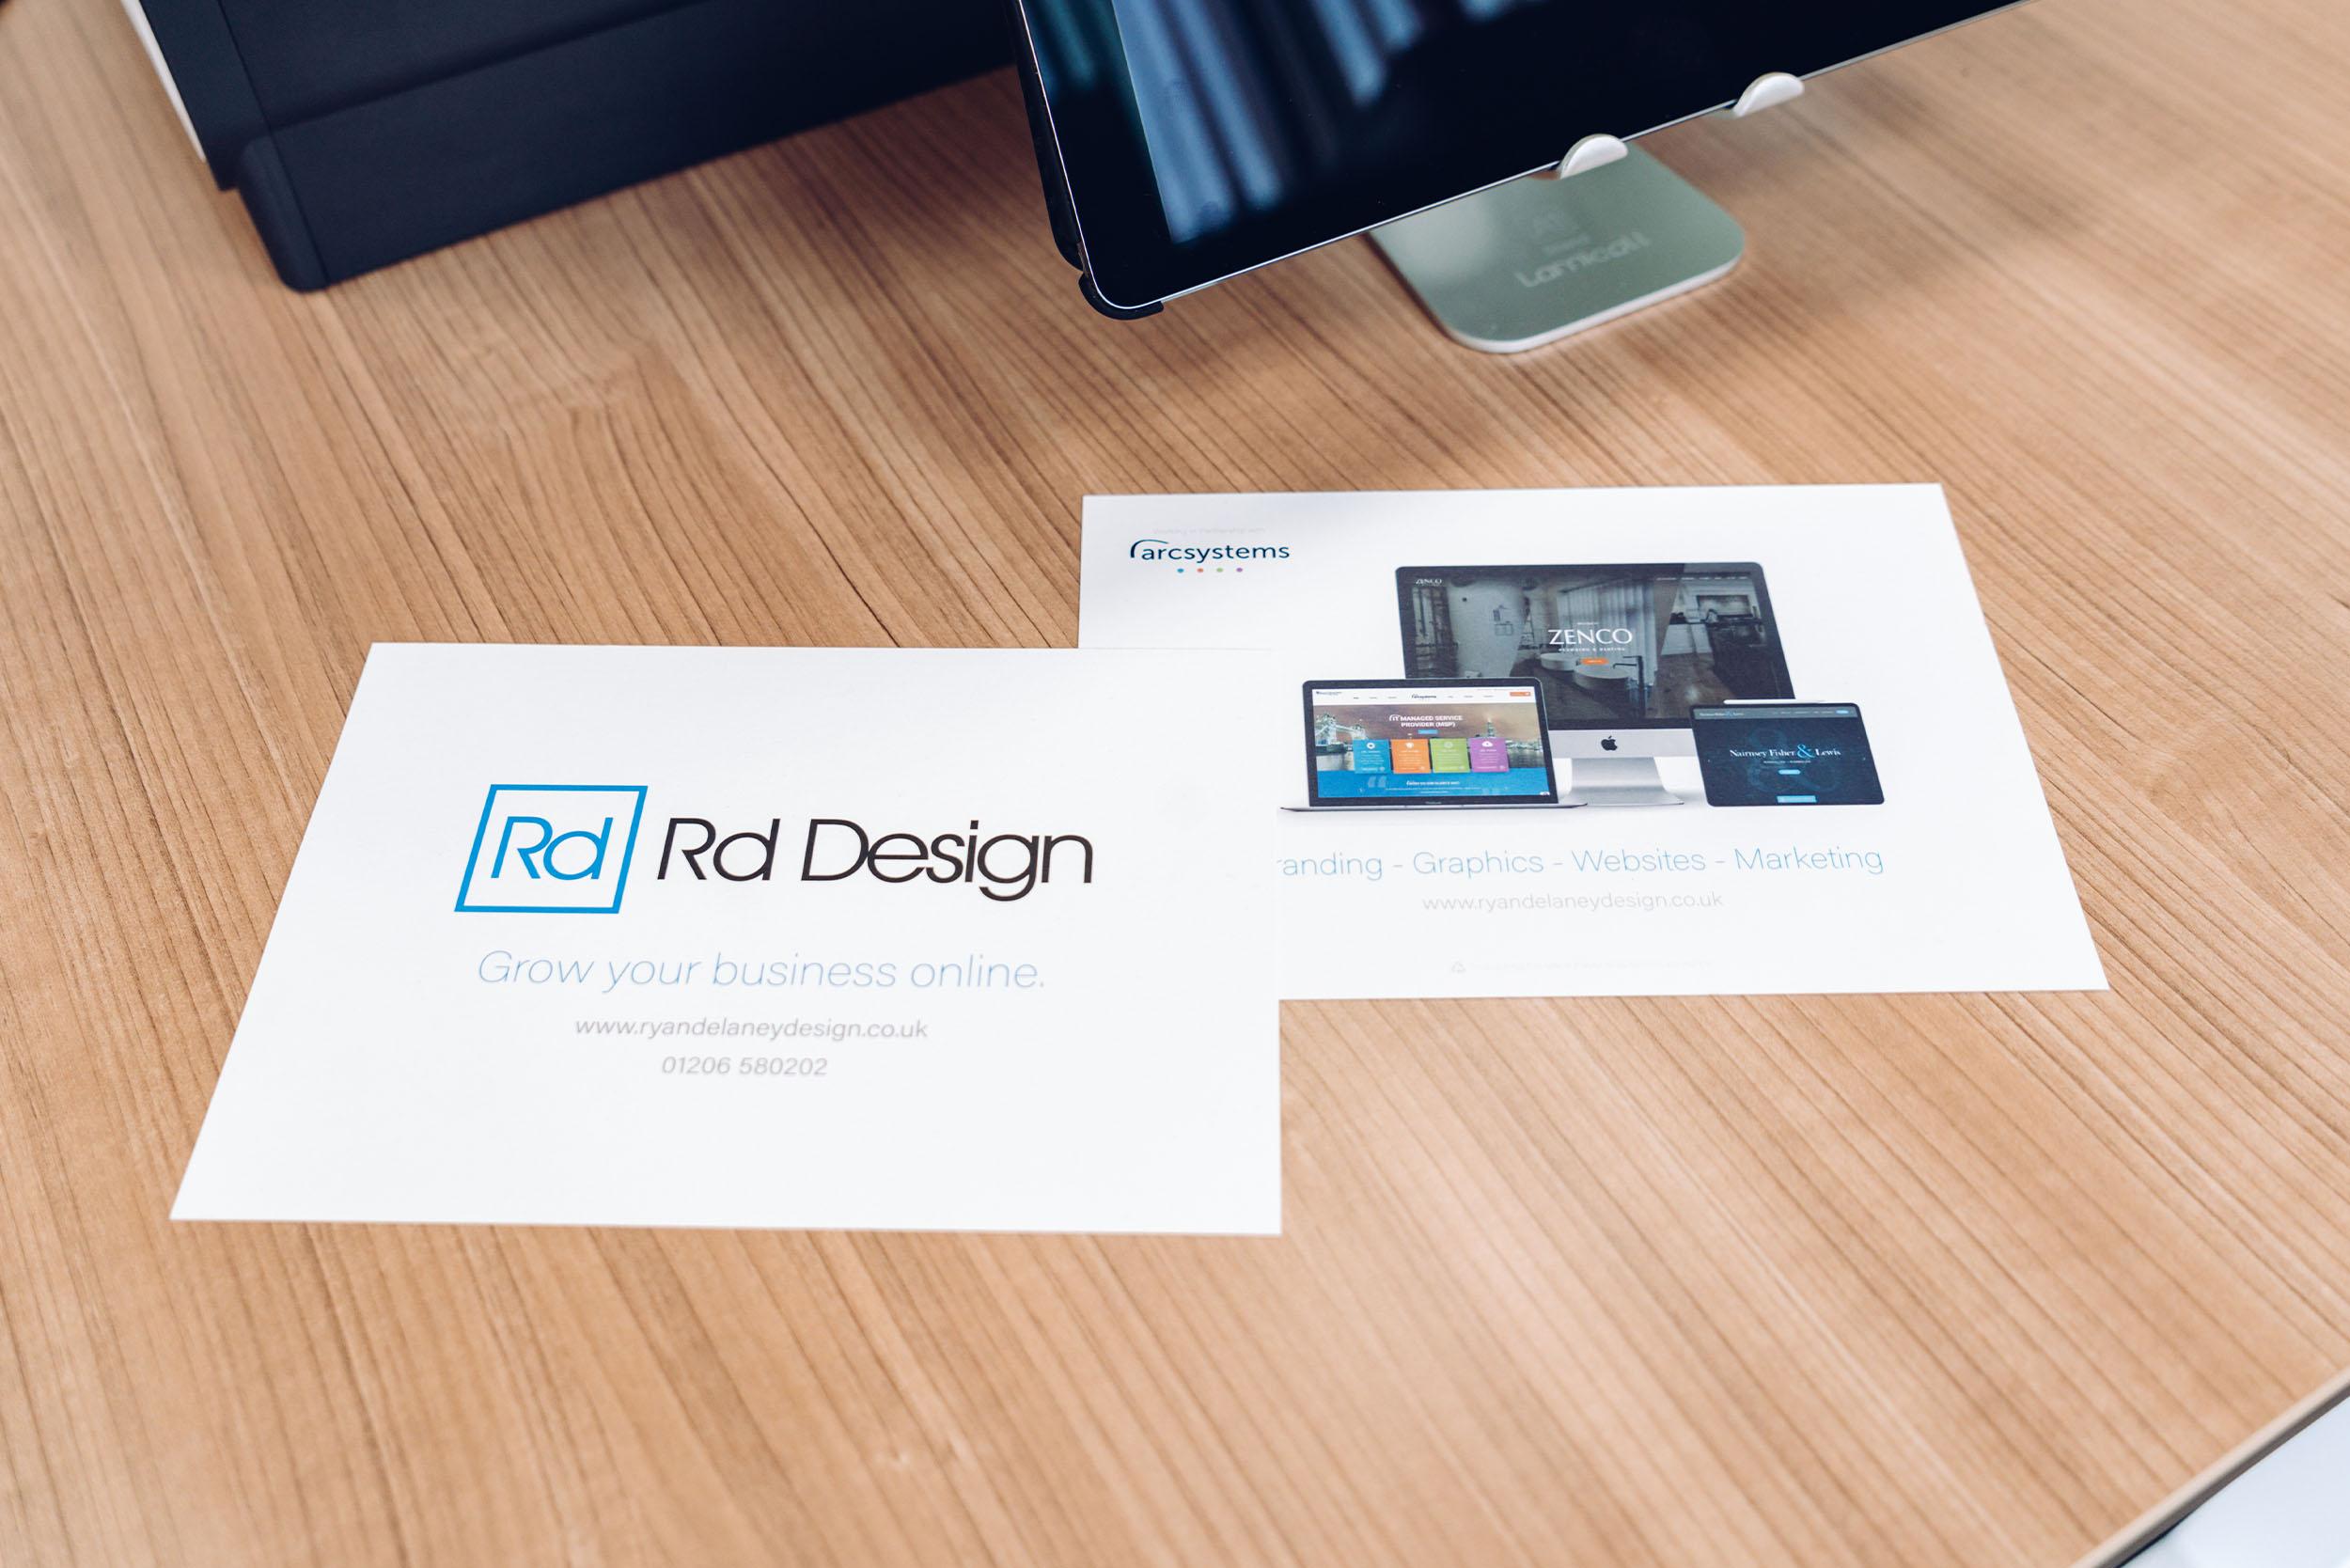 Rd Design - Marketing and Design Studio - Colchester, Essex 5.jpg